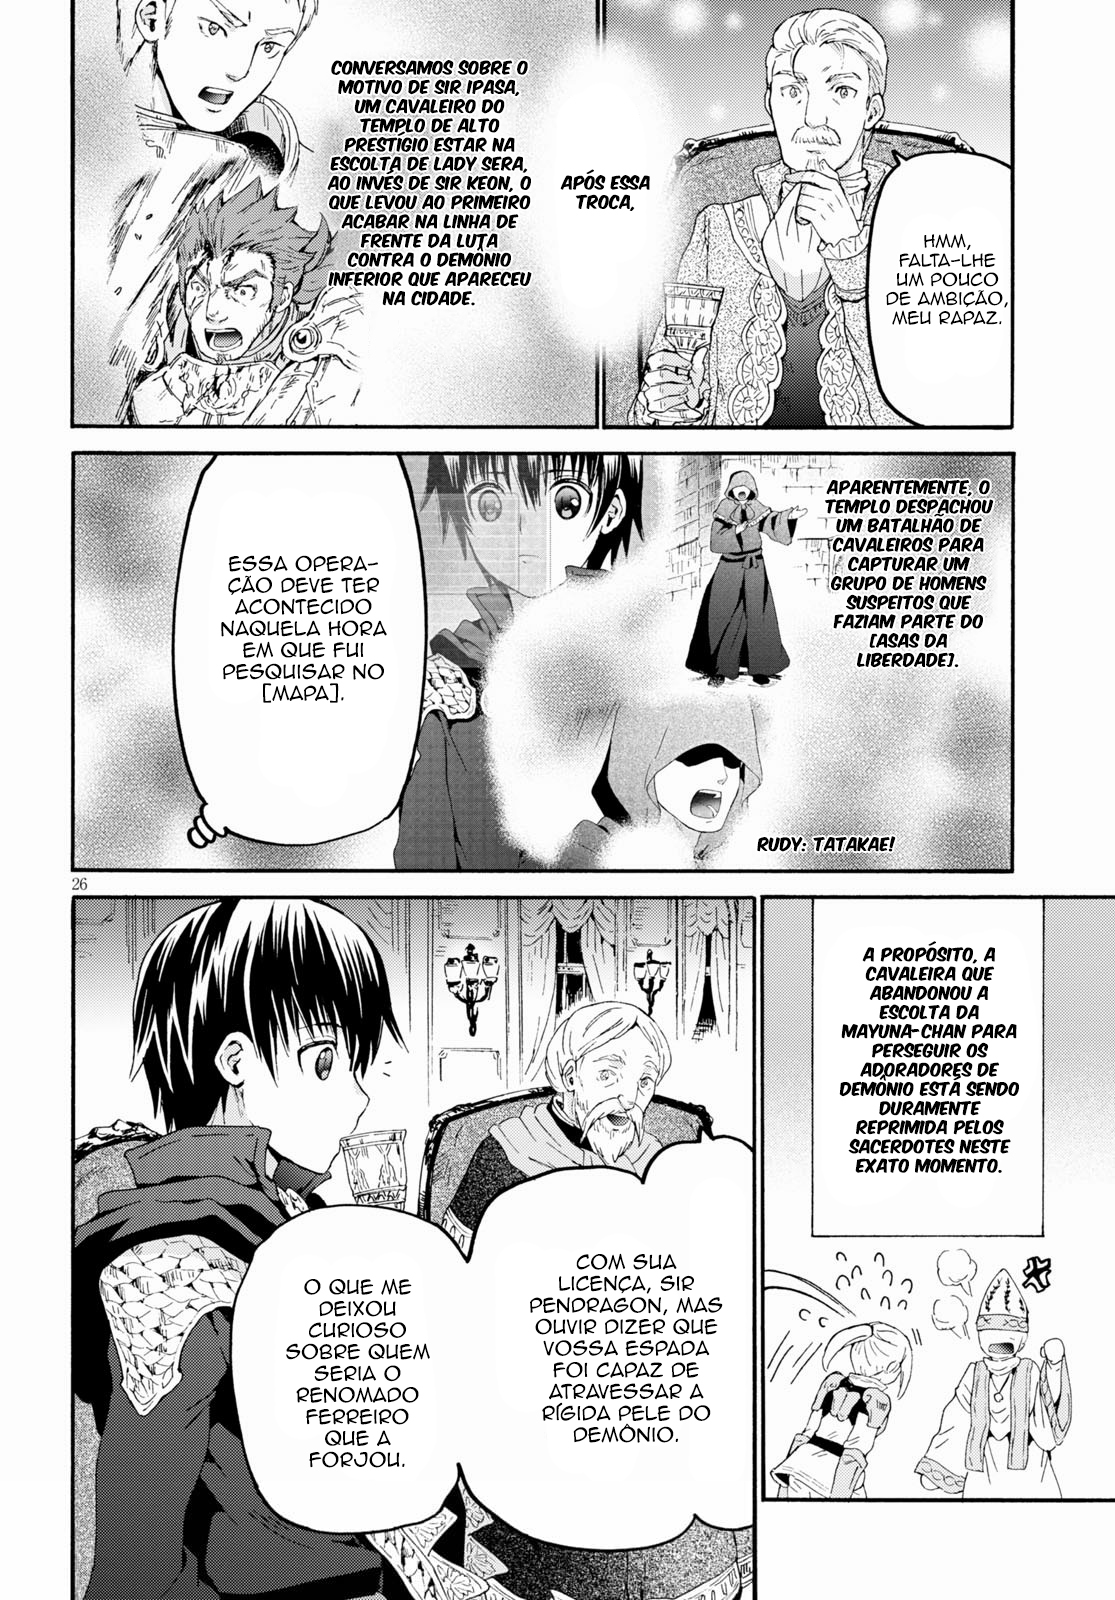 Comic Dragon Age: Death March Kara Hajimaru Isekai Kyousoukyoku / Death March To The Parallel World Rhapsody Manga 82